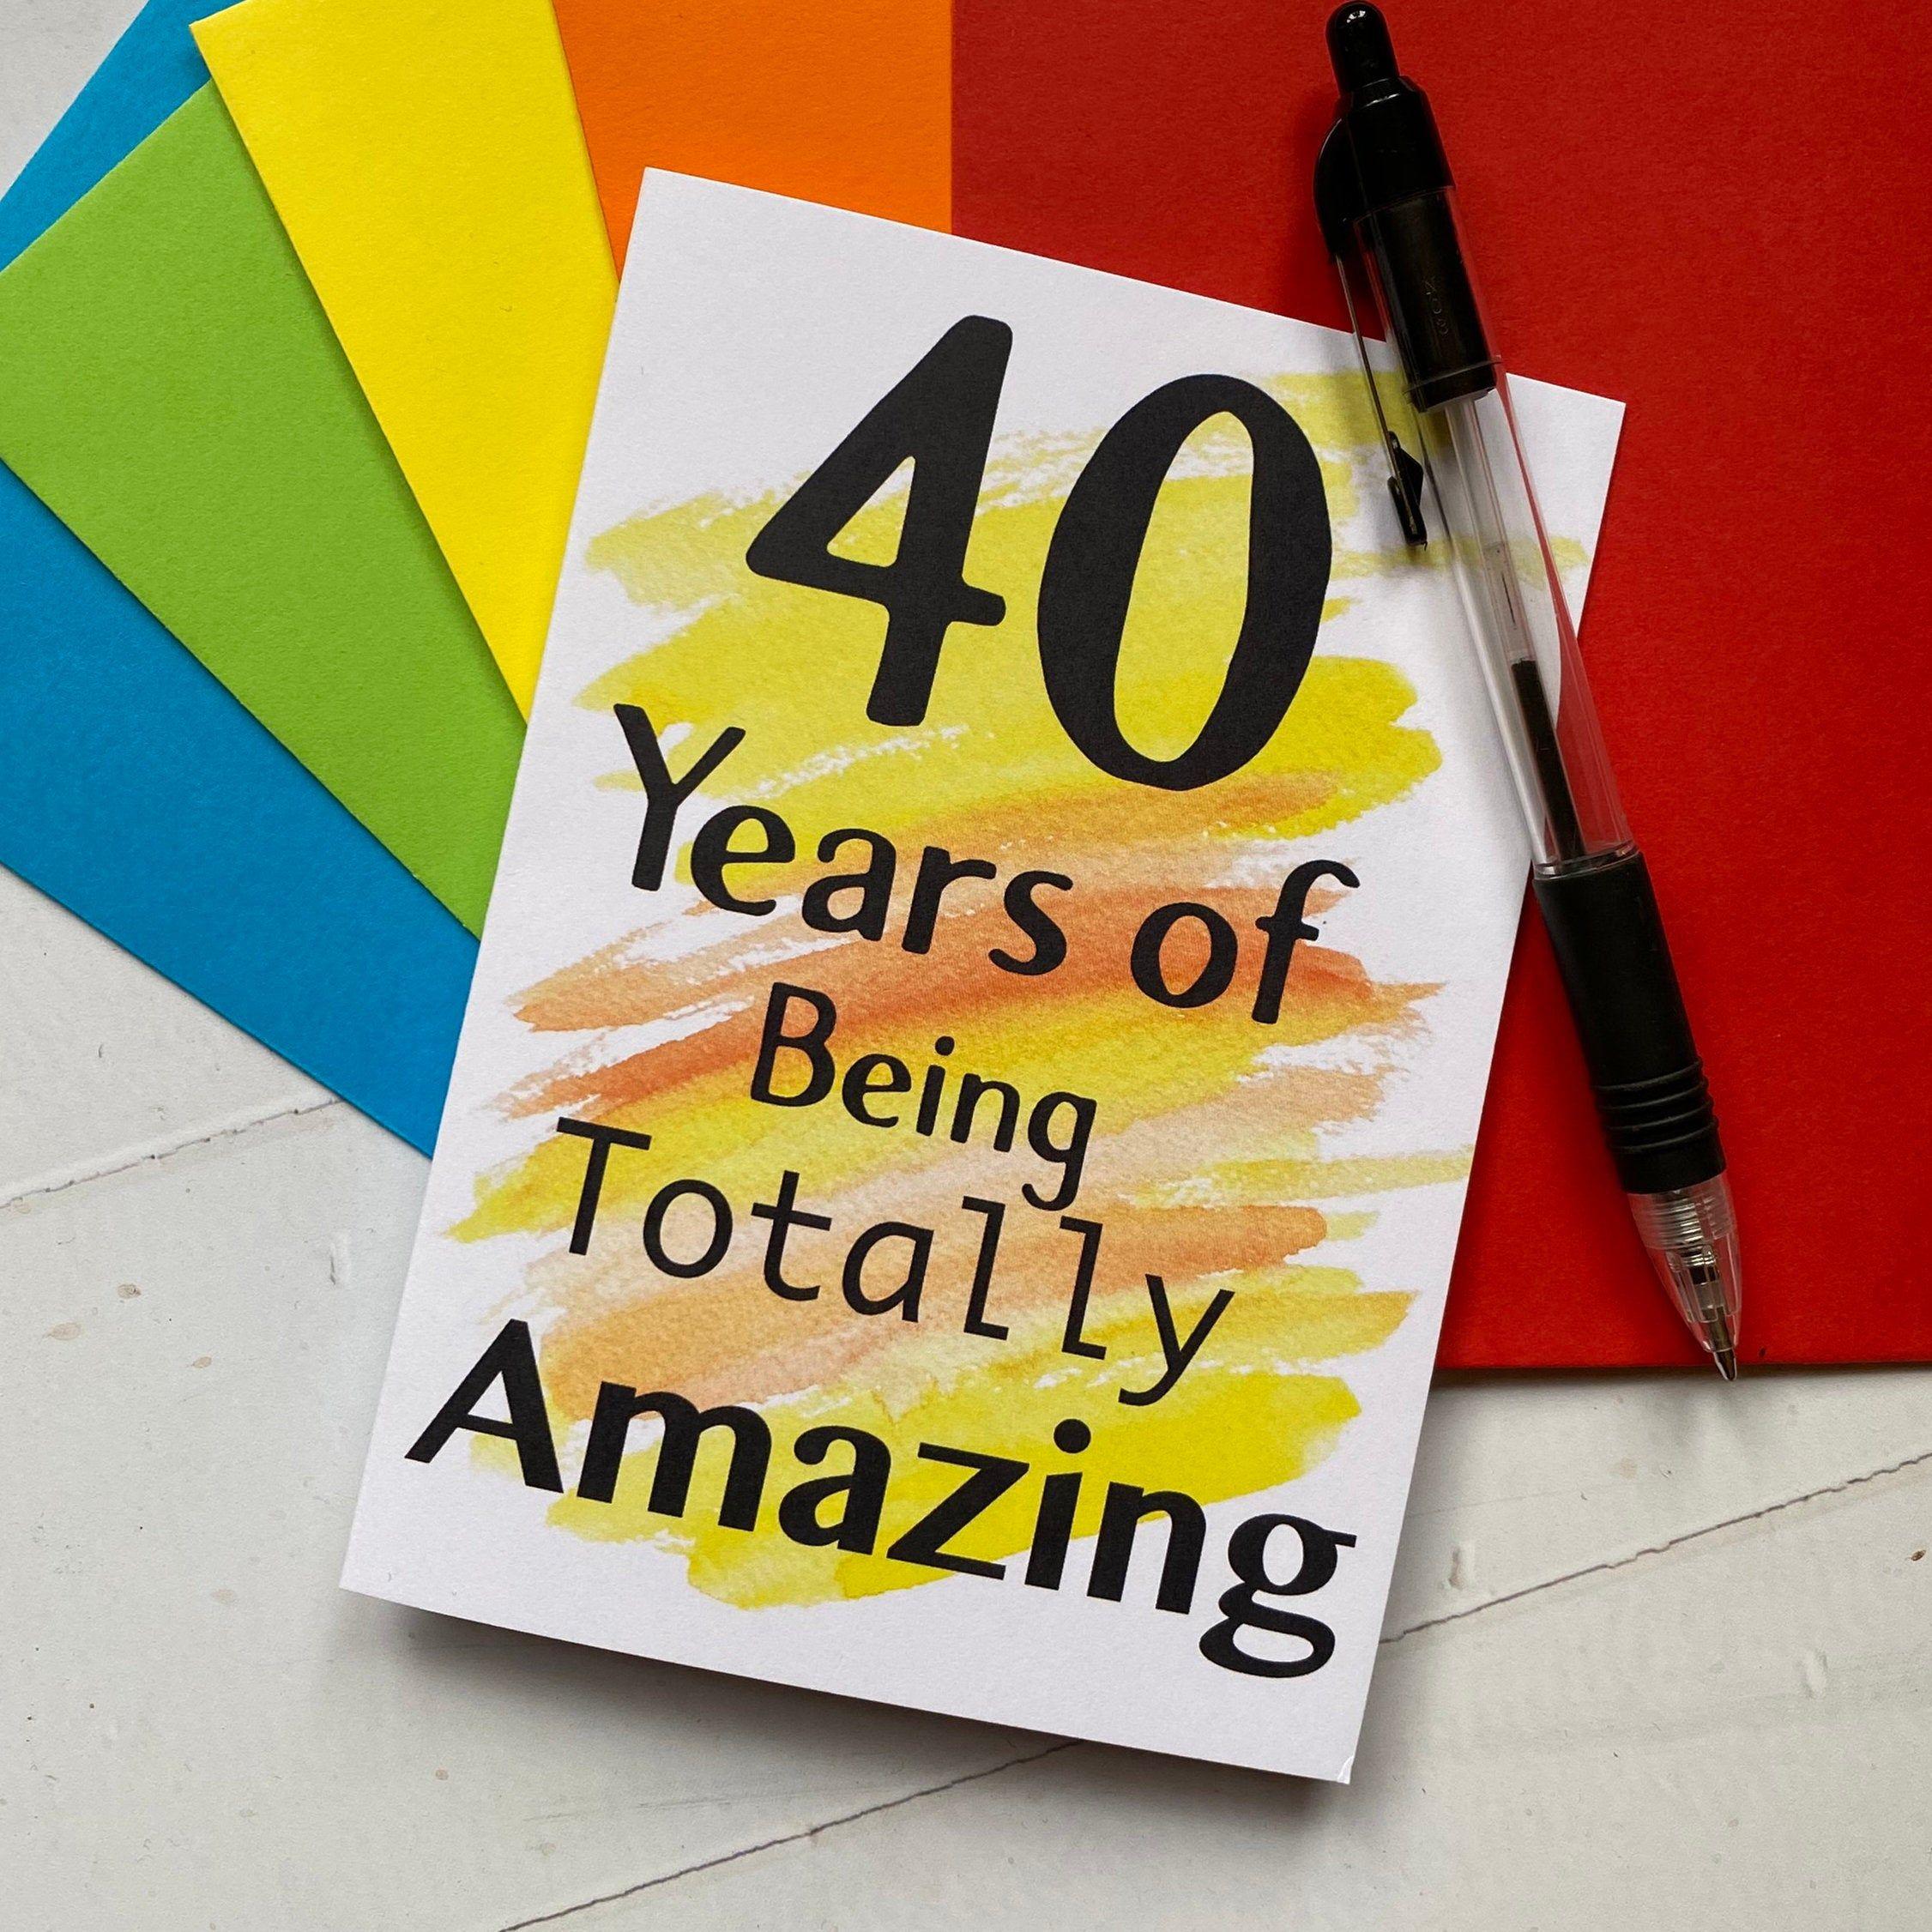 40th Birthday Card Fun 40th Card 40 Years Of Being Amazing Birthday Card 40th Birthday Fu 40th Birthday Cards Old Birthday Cards Birthday Cards For Men